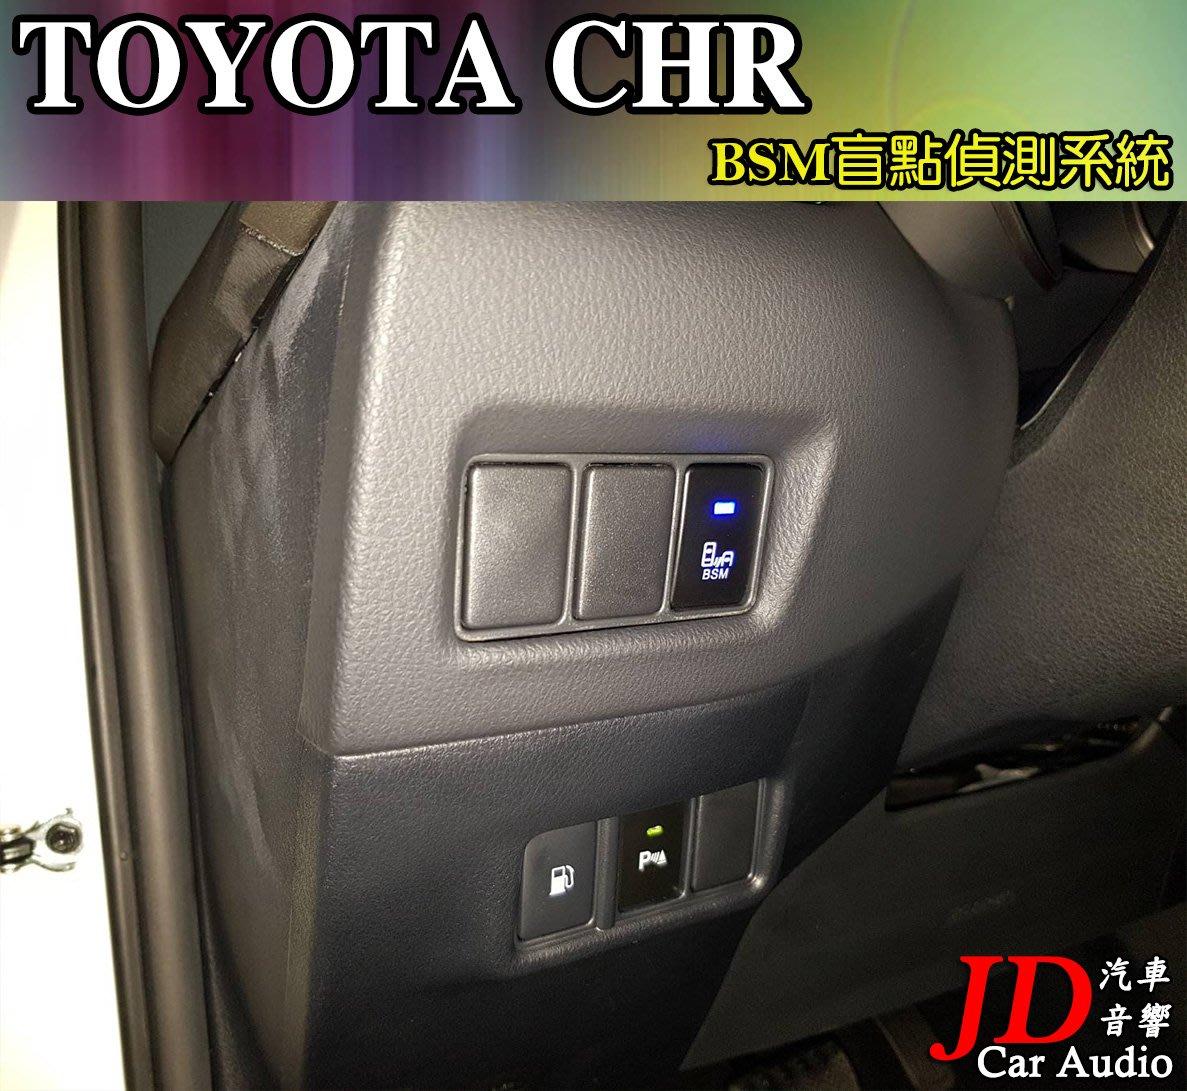 【JD汽車音響】實裝車 TOYOTA CHR BSM盲點偵測系統 盲區偵測系統 車側警示 NCC國家認證 免鑽洞。1